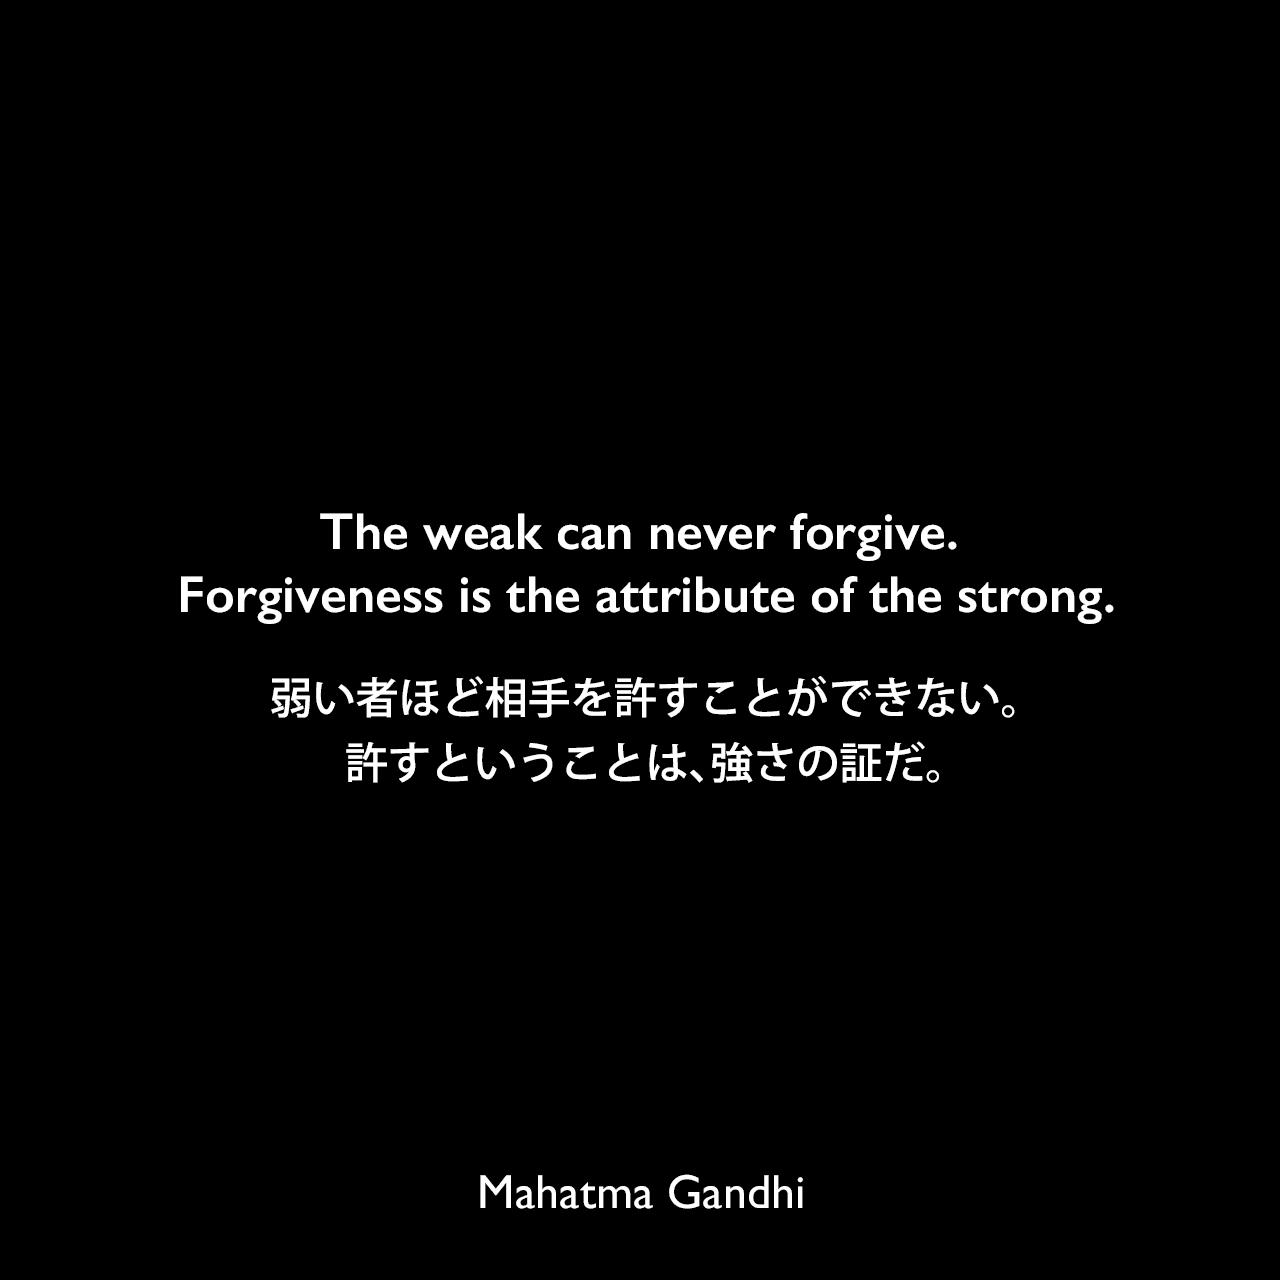 The weak can never forgive. Forgiveness is the attribute of the strong.弱い者ほど相手を許すことができない。許すということは、強さの証だ。Mahatma Gandhi